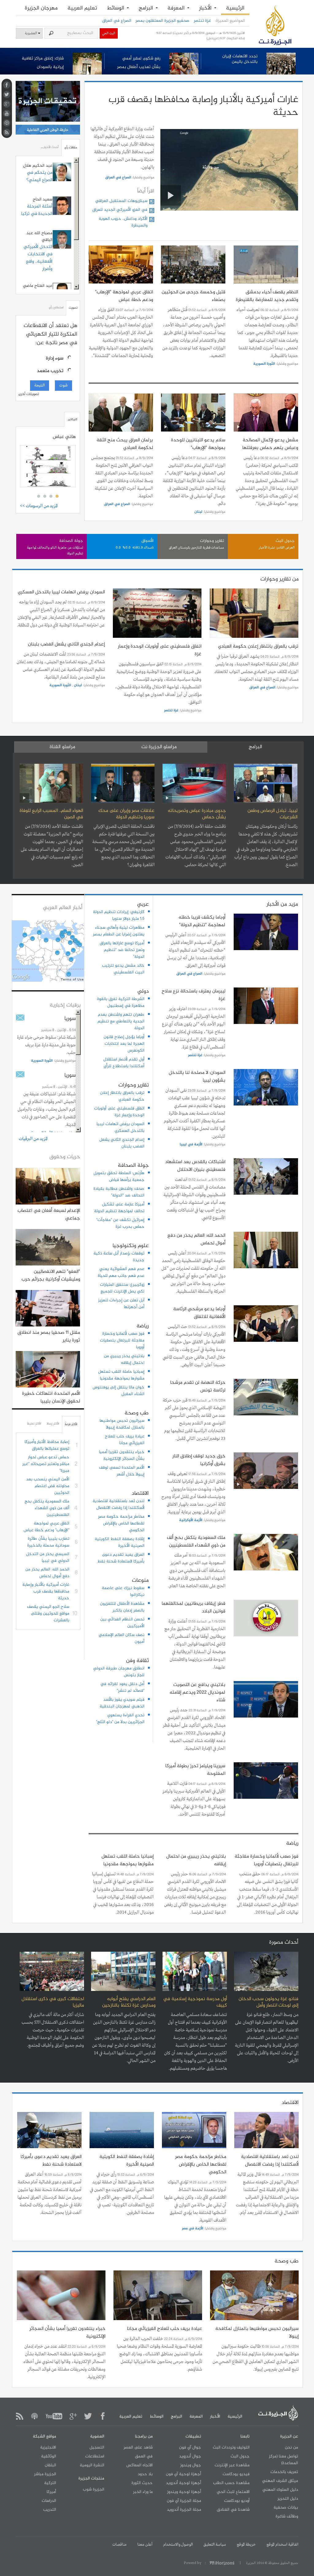 Al Jazeera at Monday Sept. 8, 2014, 7:07 a.m. UTC